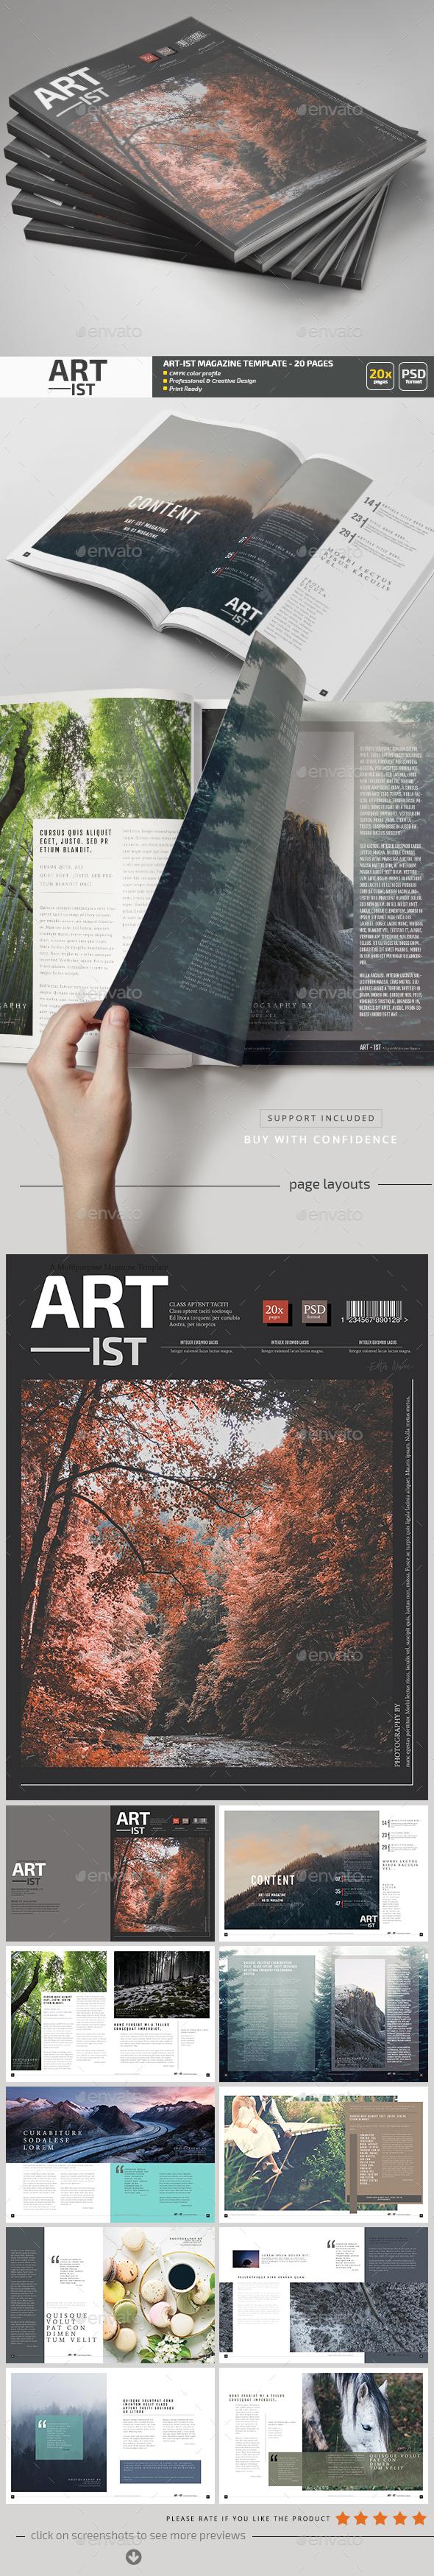 Art-ist Magazine Template V.13 - Magazines Print Templates